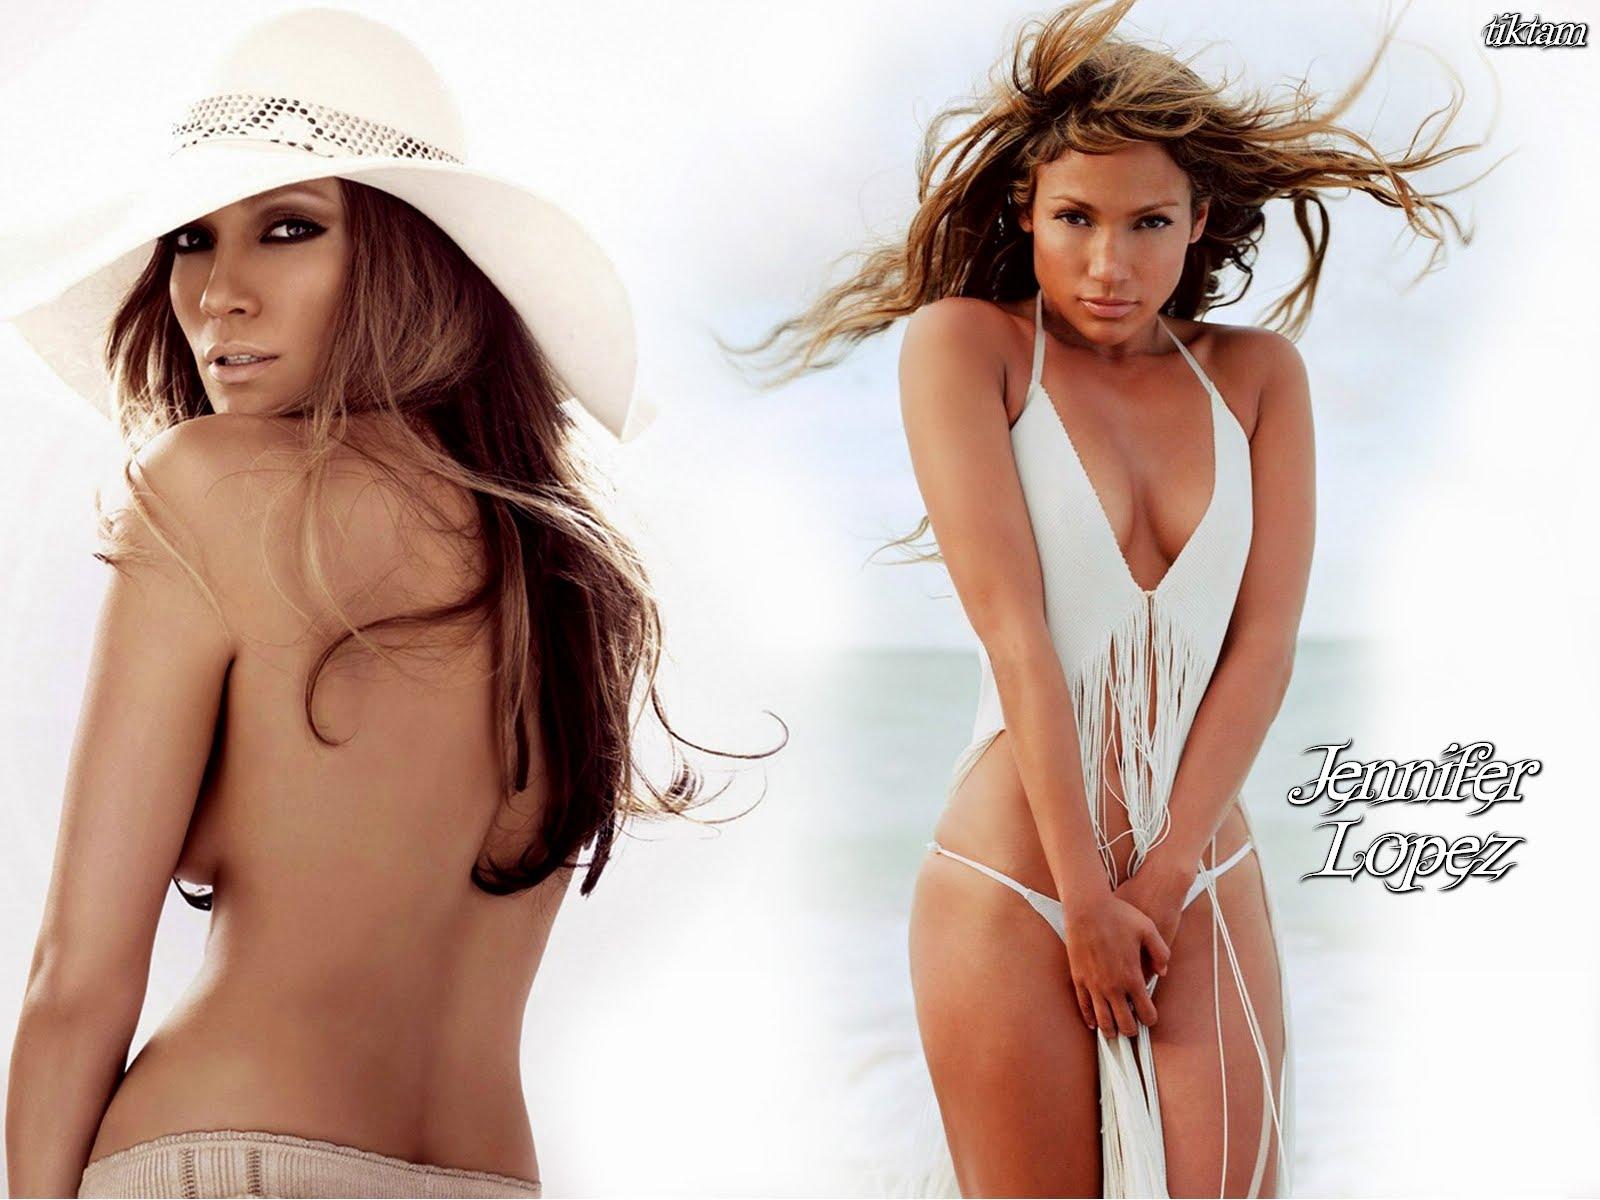 http://3.bp.blogspot.com/_rN33-_rrbXA/TCRB2dKPa2I/AAAAAAAAJjg/a2t_8ud4x8w/s1600/Jennifer-Lopez-jennifer-lopez-43913_1600_1200.jpg